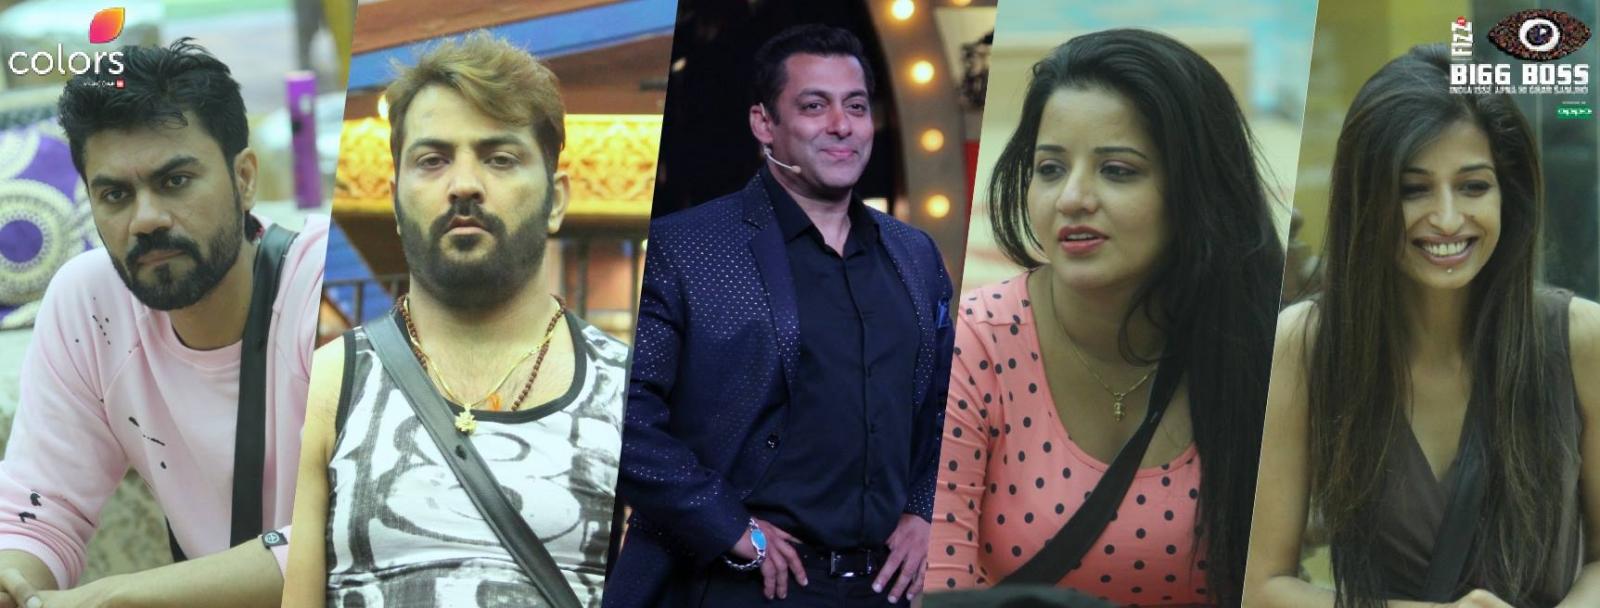 Bigg Boss 10 with Salman Khan